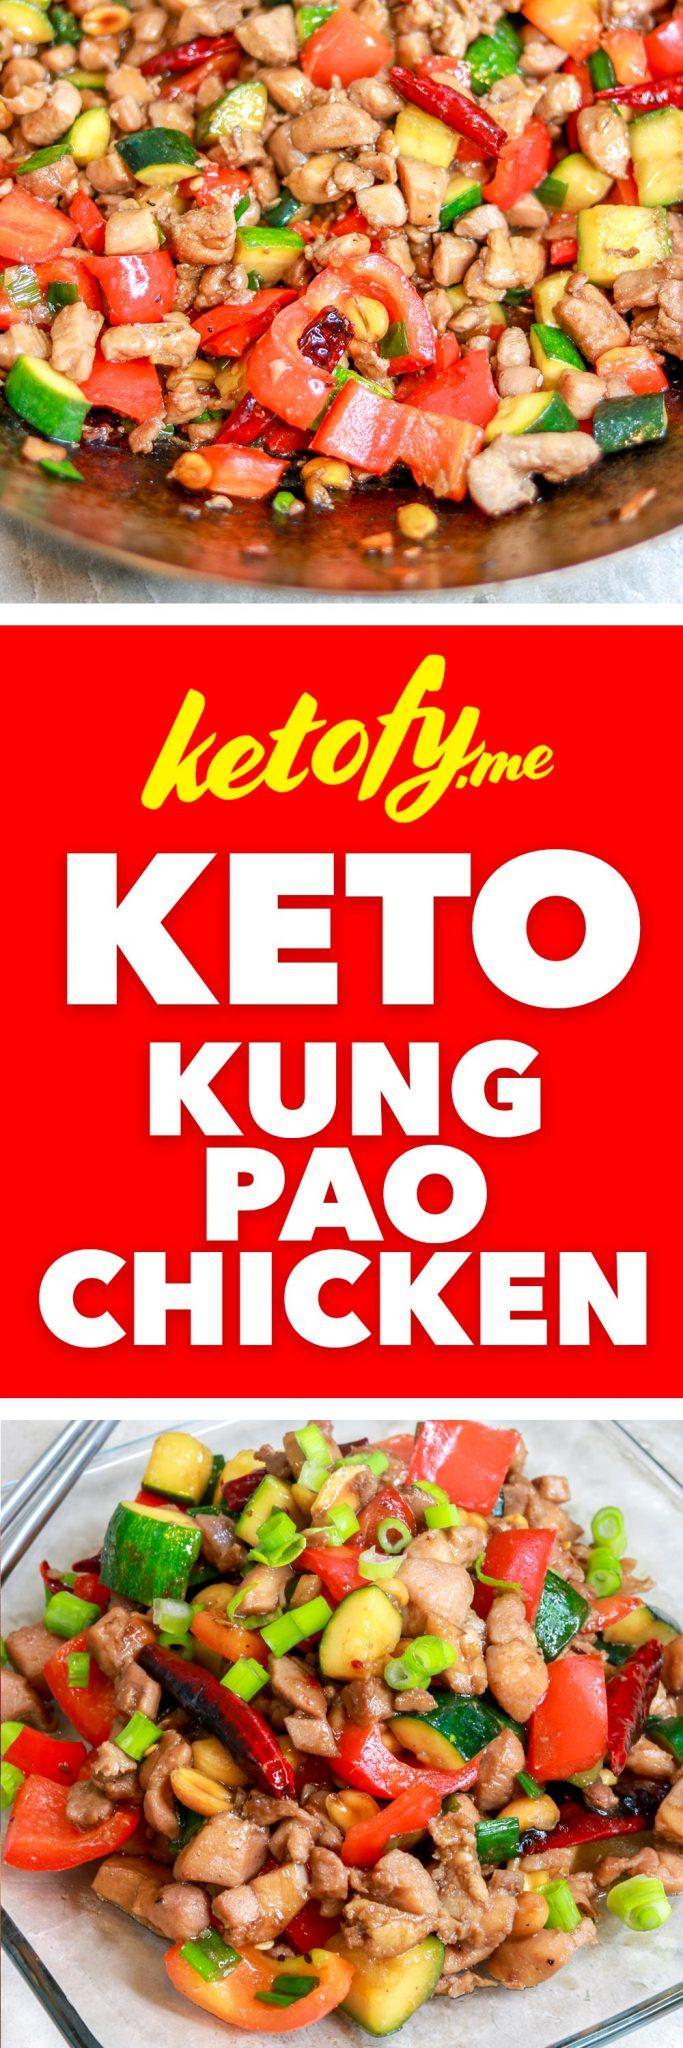 Ketofy.me - Keto & Low Carb Kung Pao Chicken | www.ketofy.me